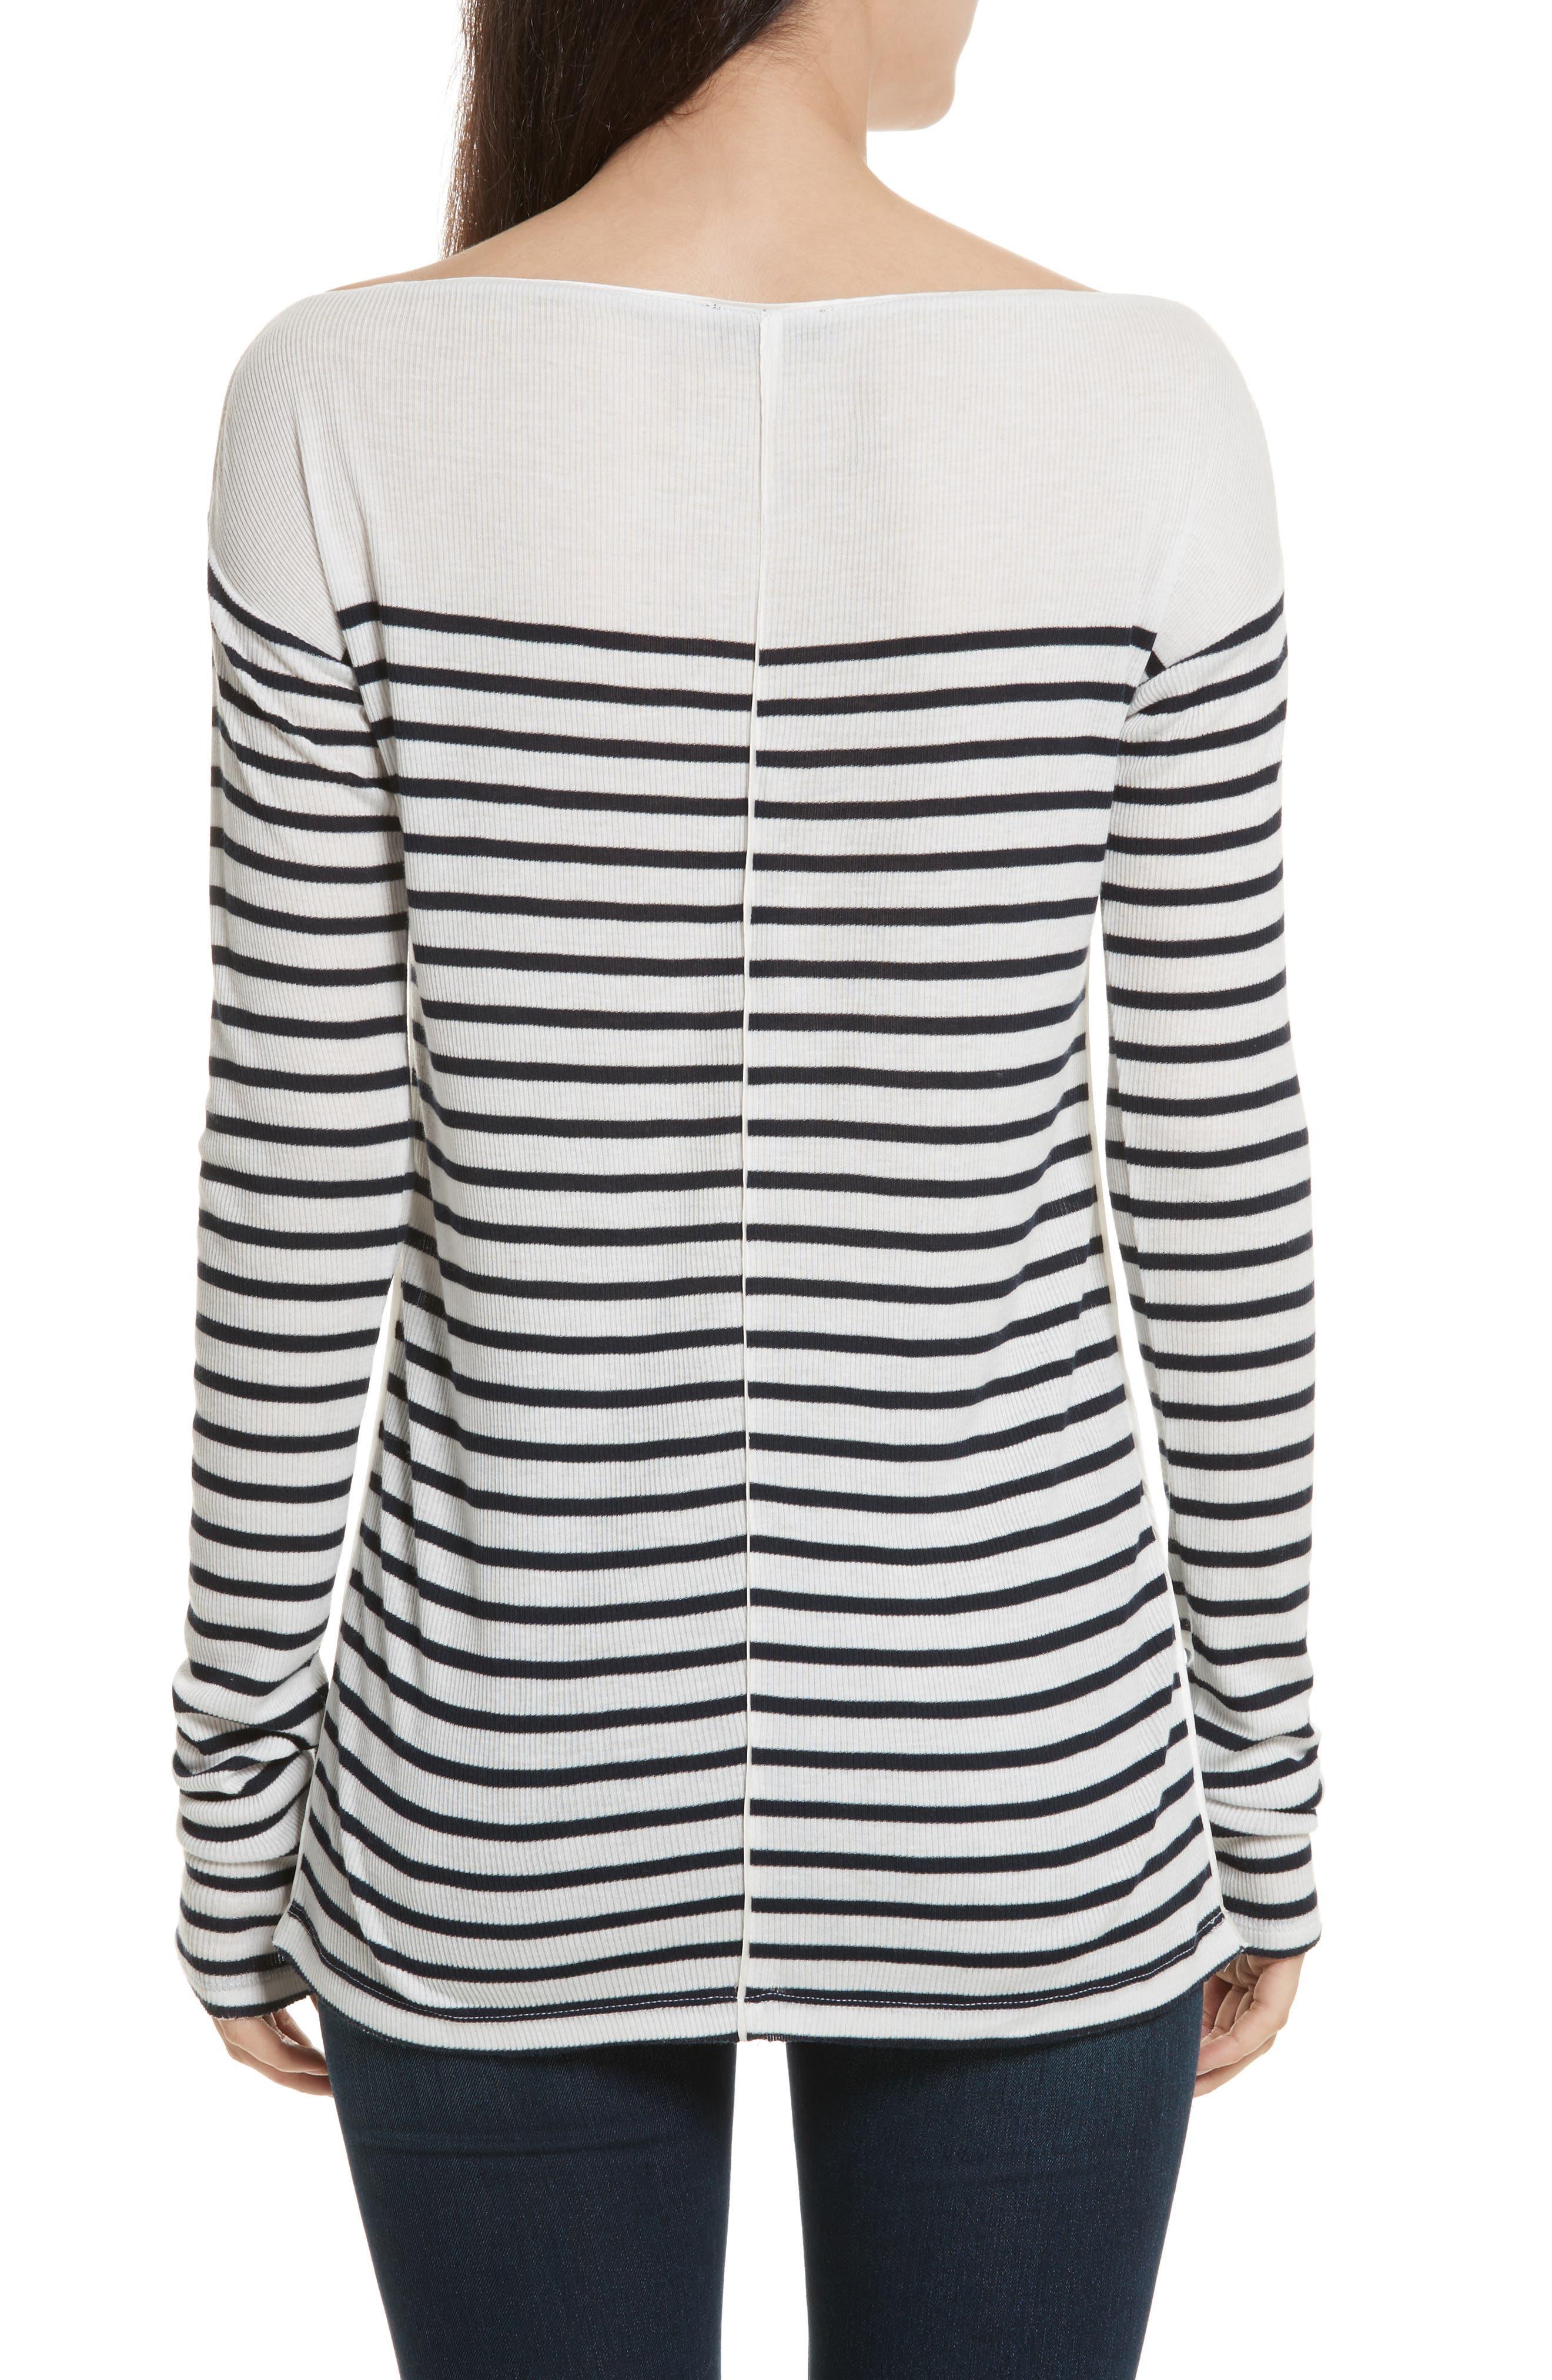 Madison Stripe Long Sleeve Top,                             Alternate thumbnail 2, color,                             Ivory/ Navy